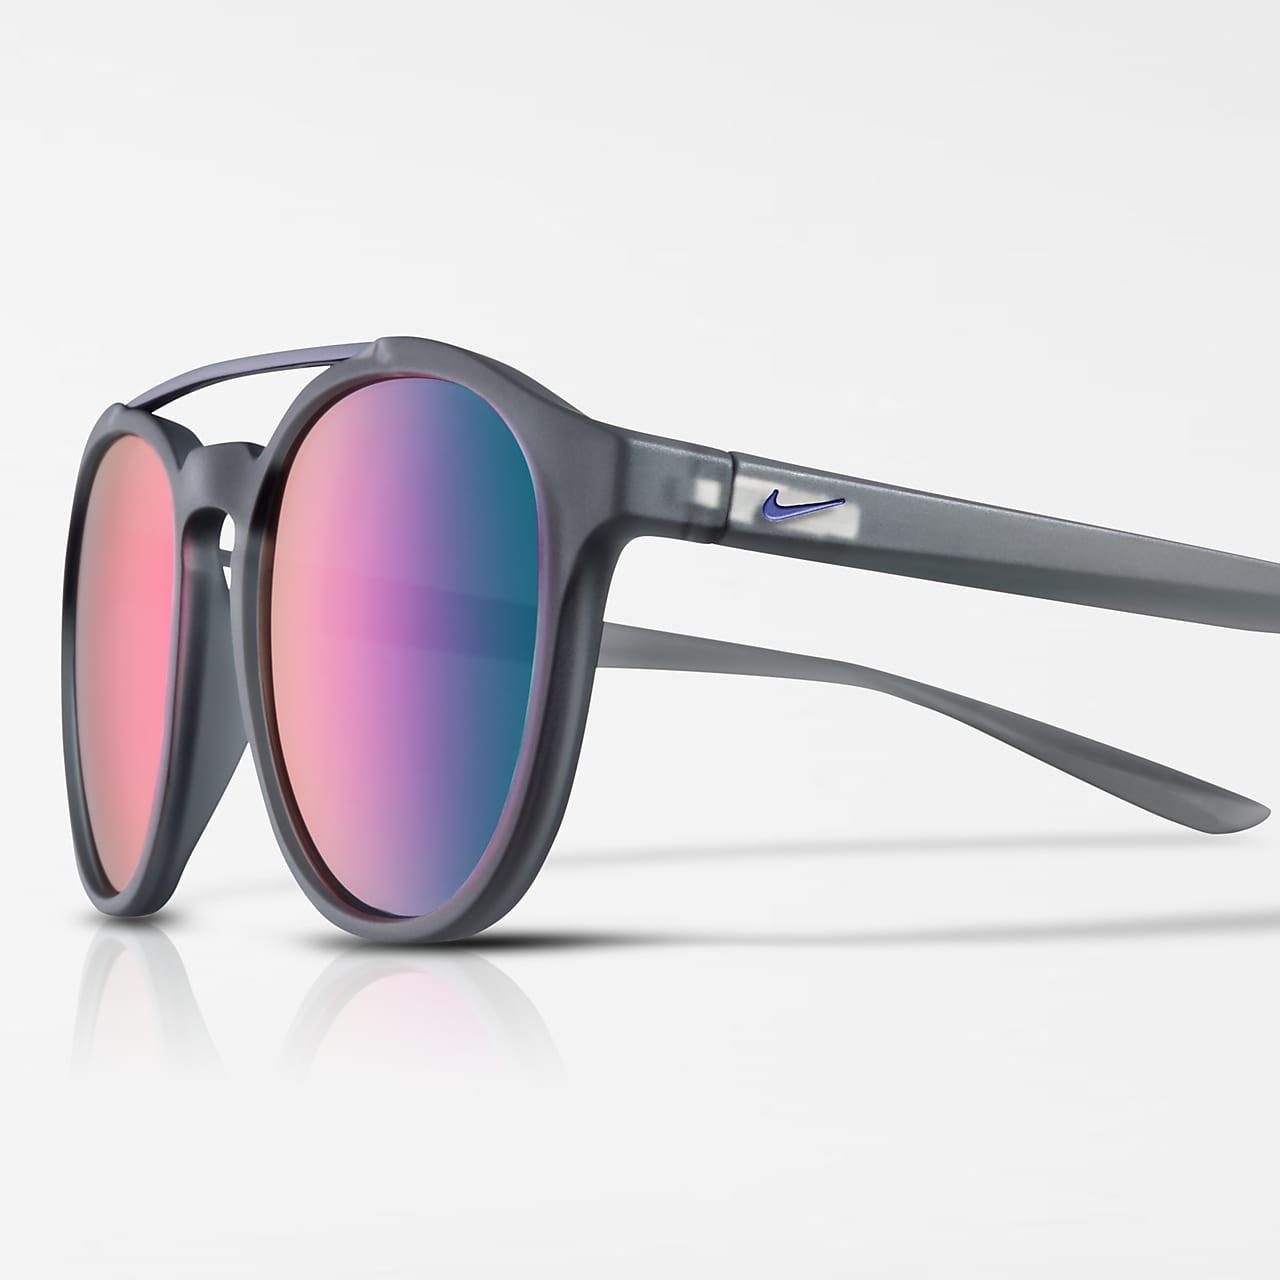 Nike Kismet Mirrored Sunglasses